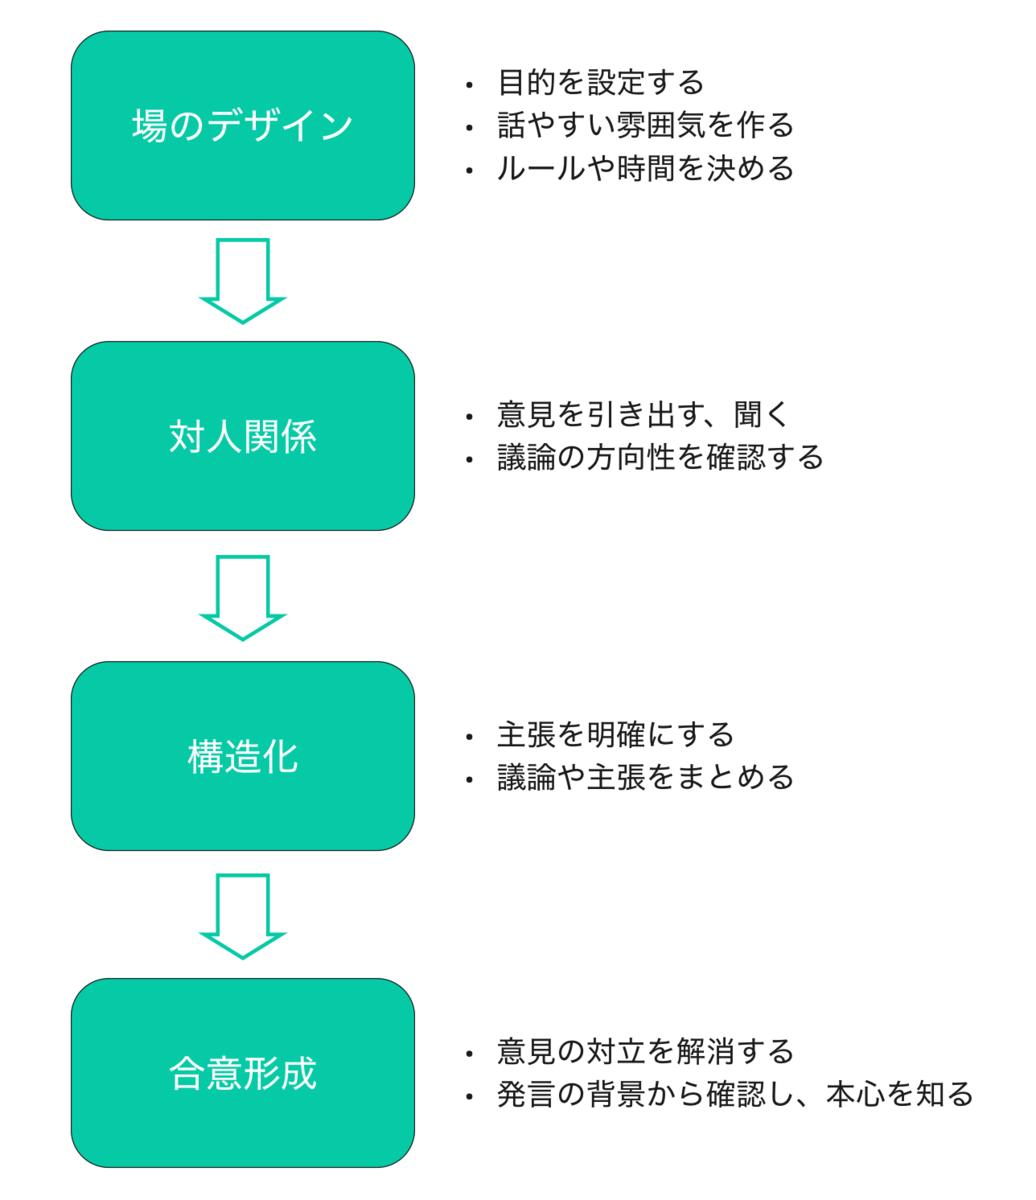 f:id:tomoya_misuda:20200816131424p:plain